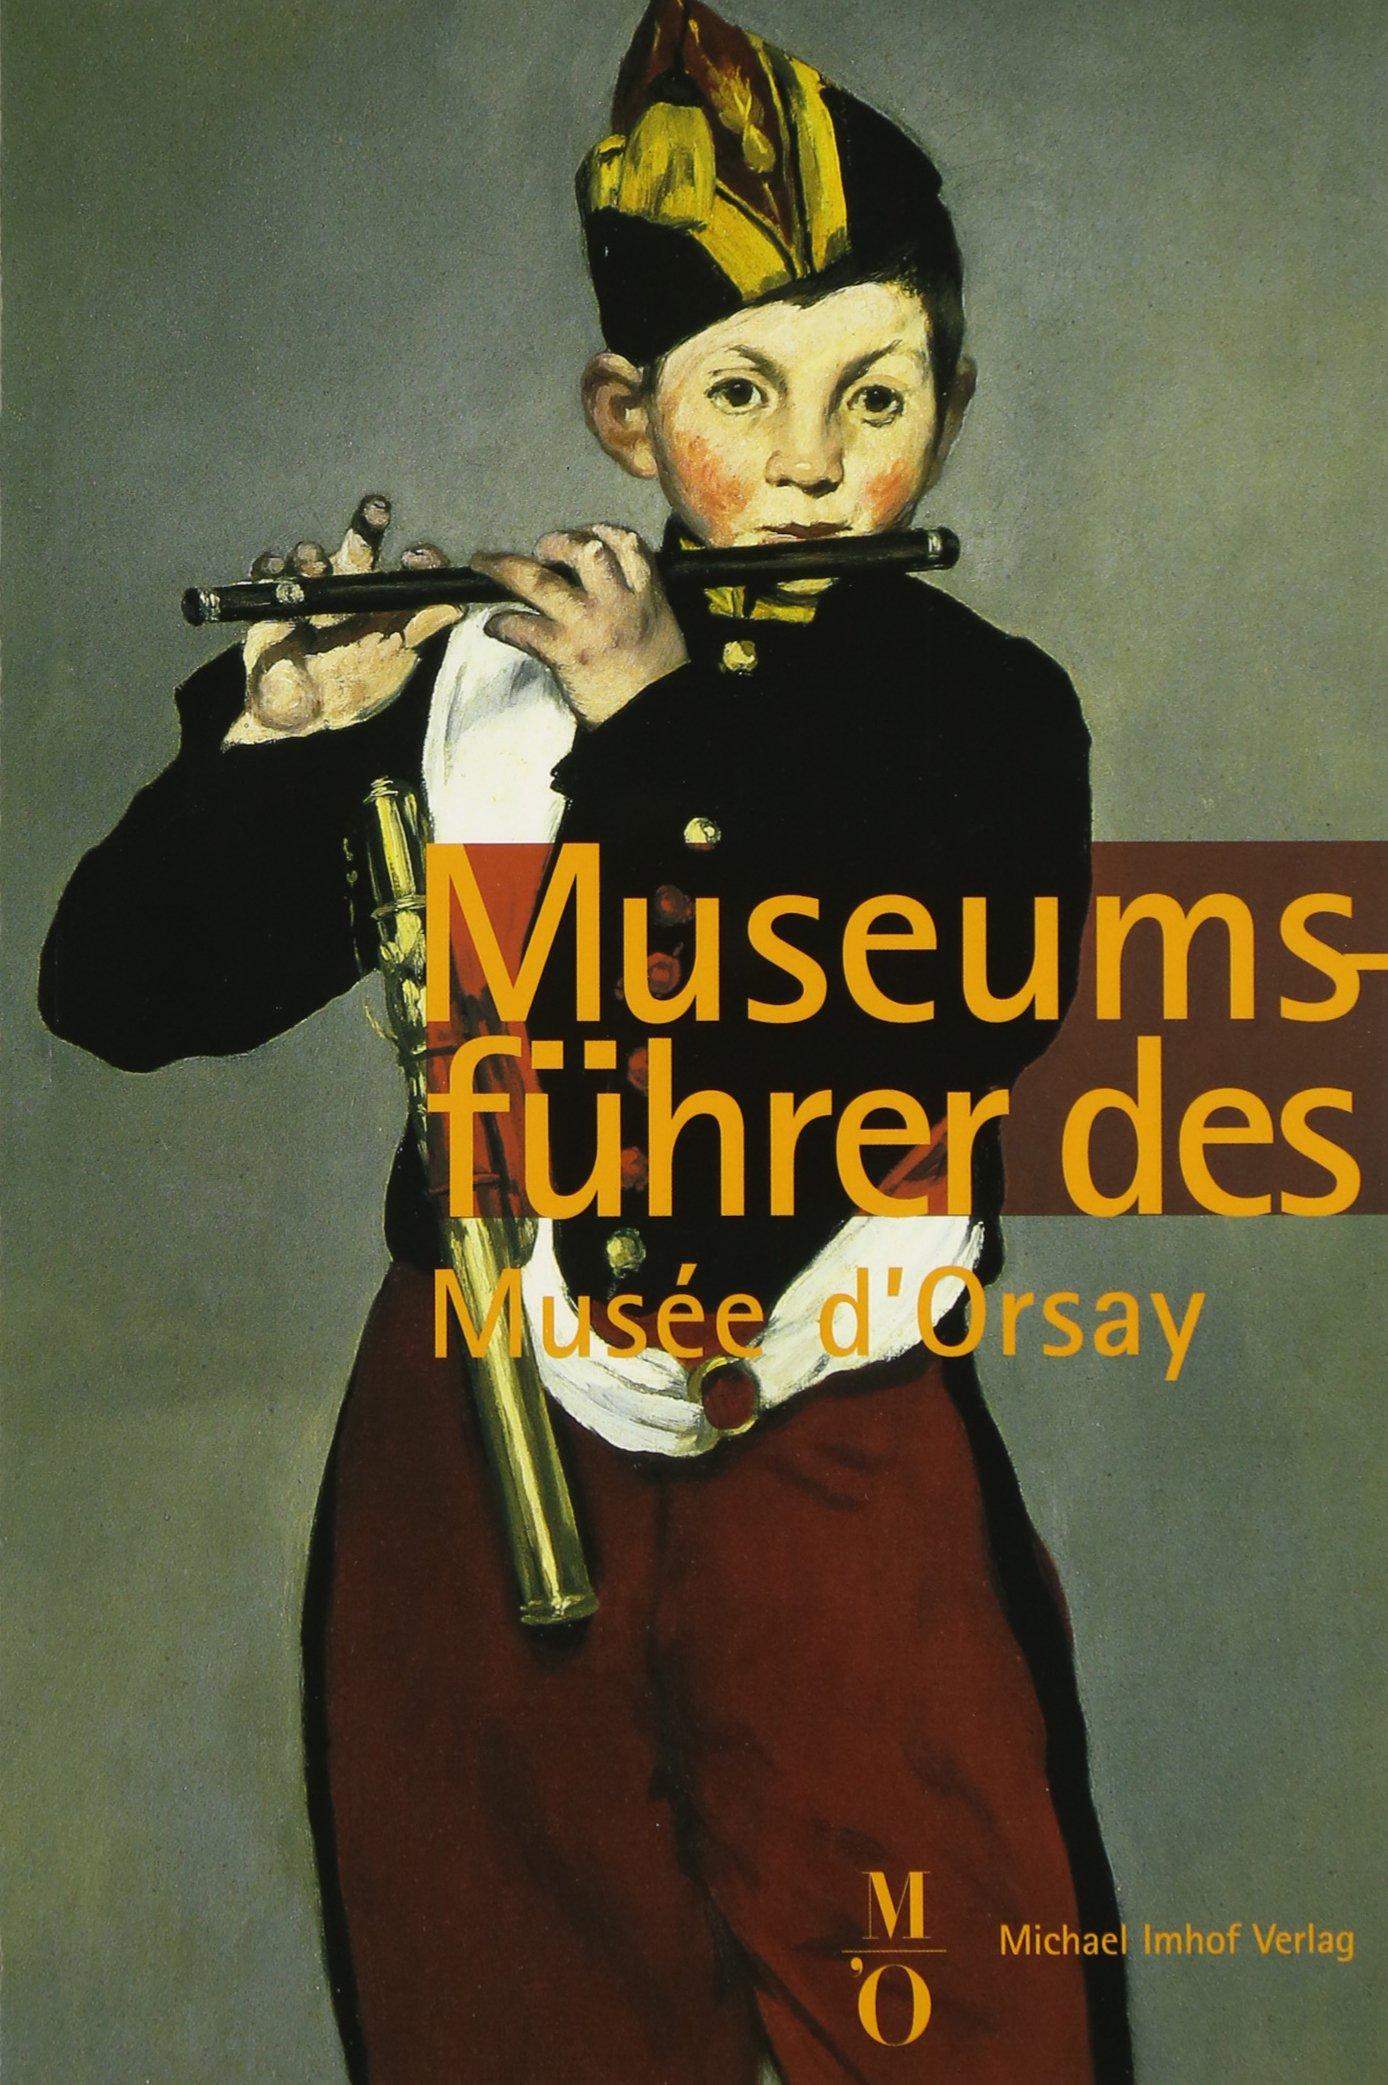 Museumsführer Musée d´Orsay